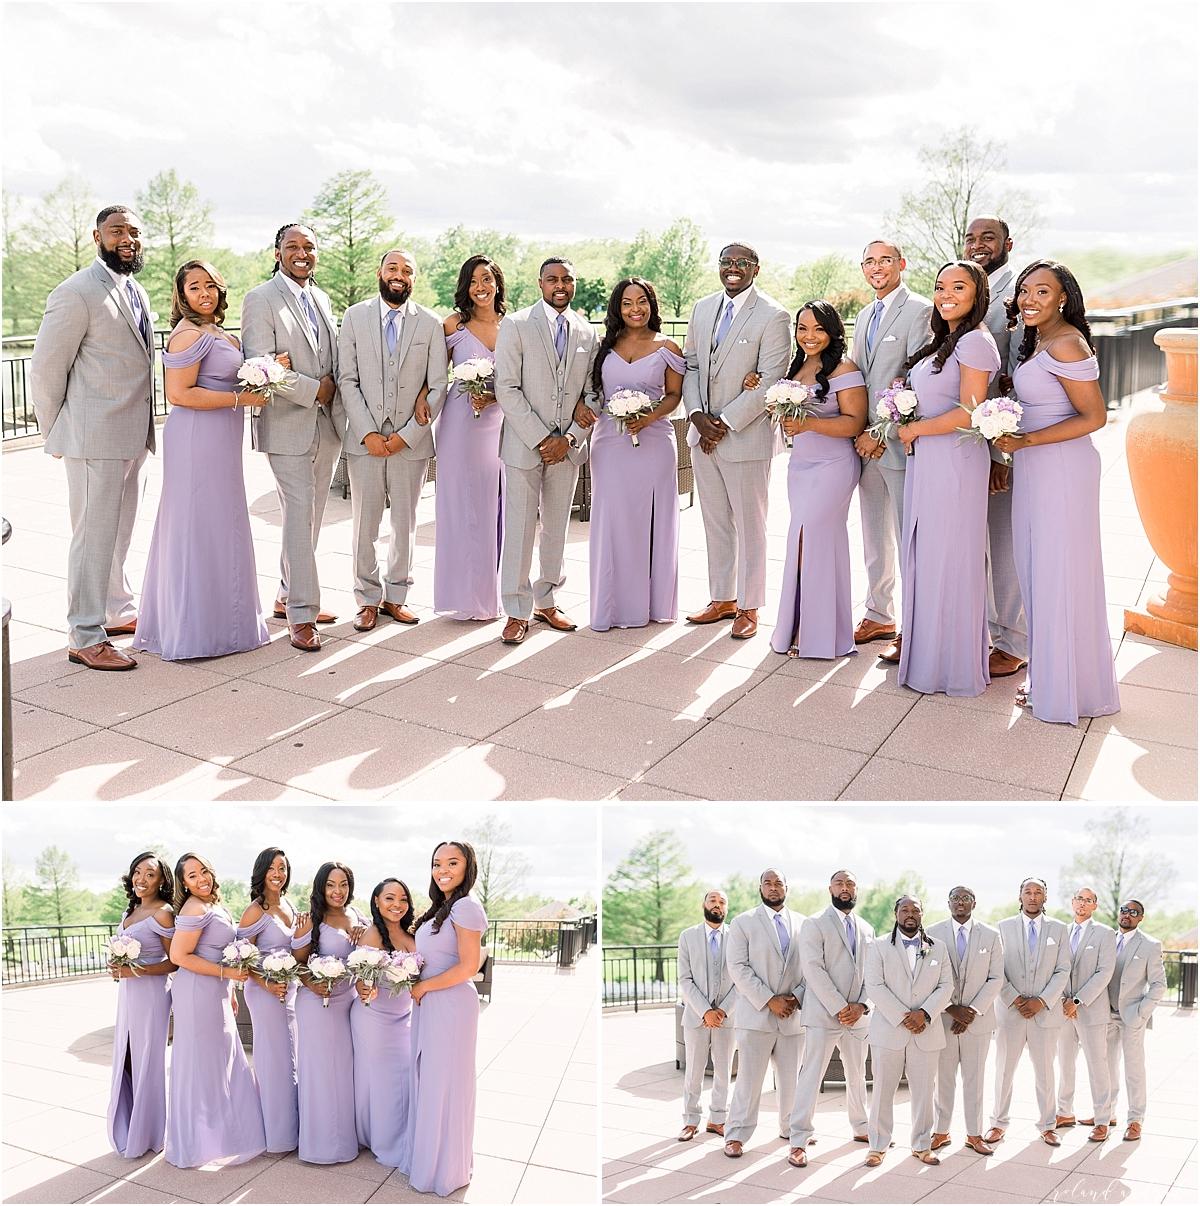 The Odyssey Wedding, Tinley Park Wedding, Chicago Wedding Photographer, Best Photographer In Tineley Park, Best Photographer In Chicago, Light And Airy Photographer_0051.jpg